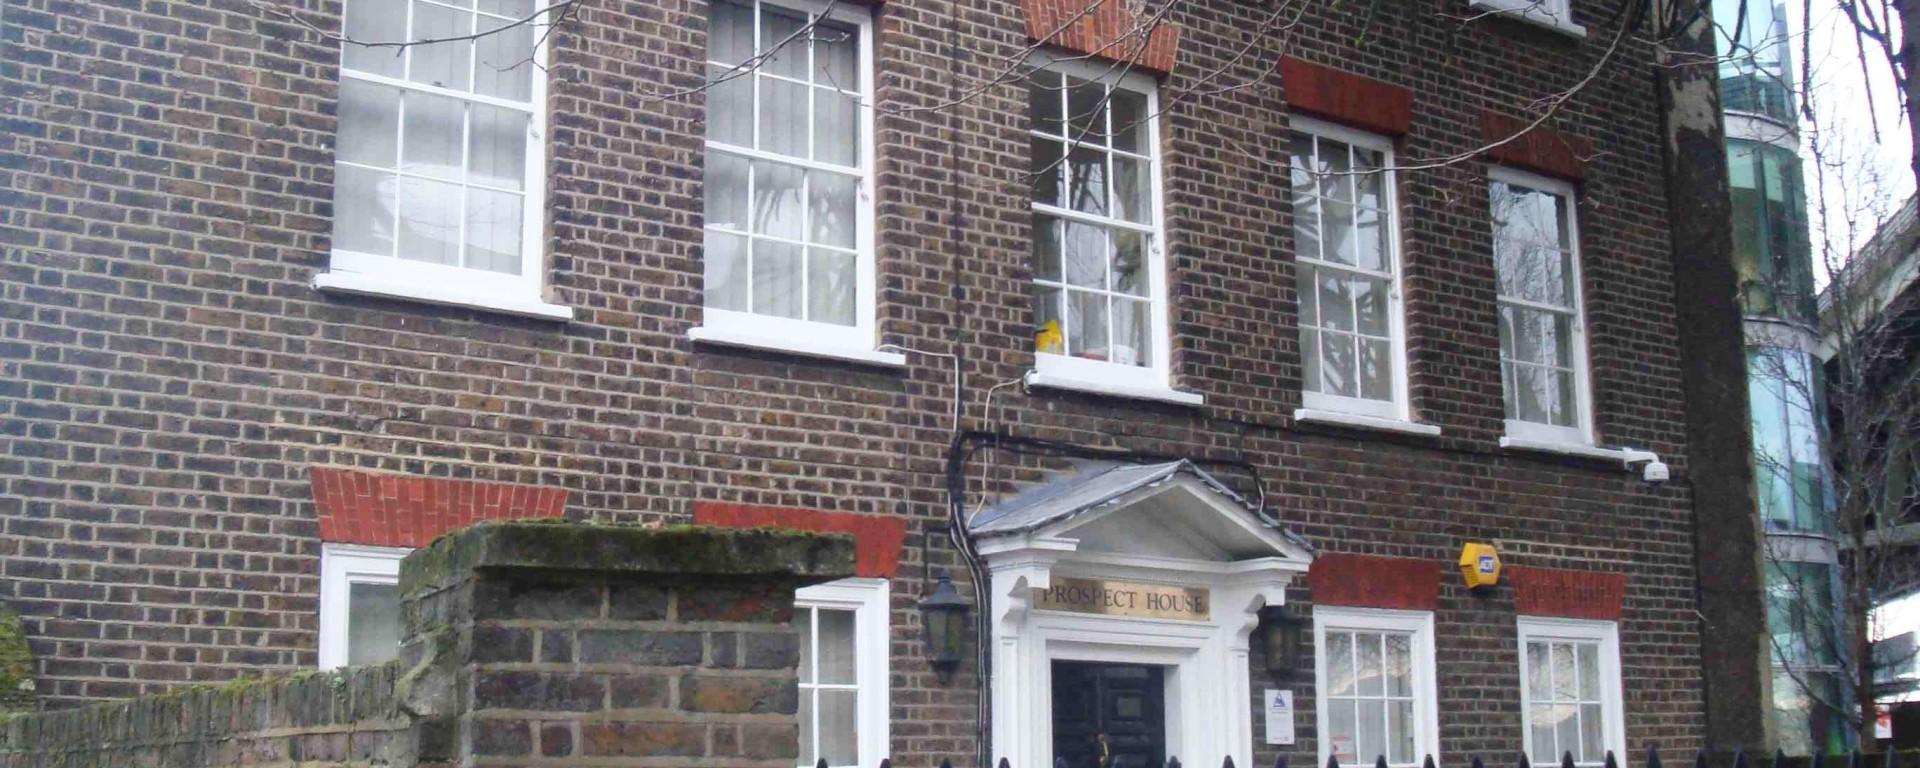 Prospect House, 67 Boston Manor Road